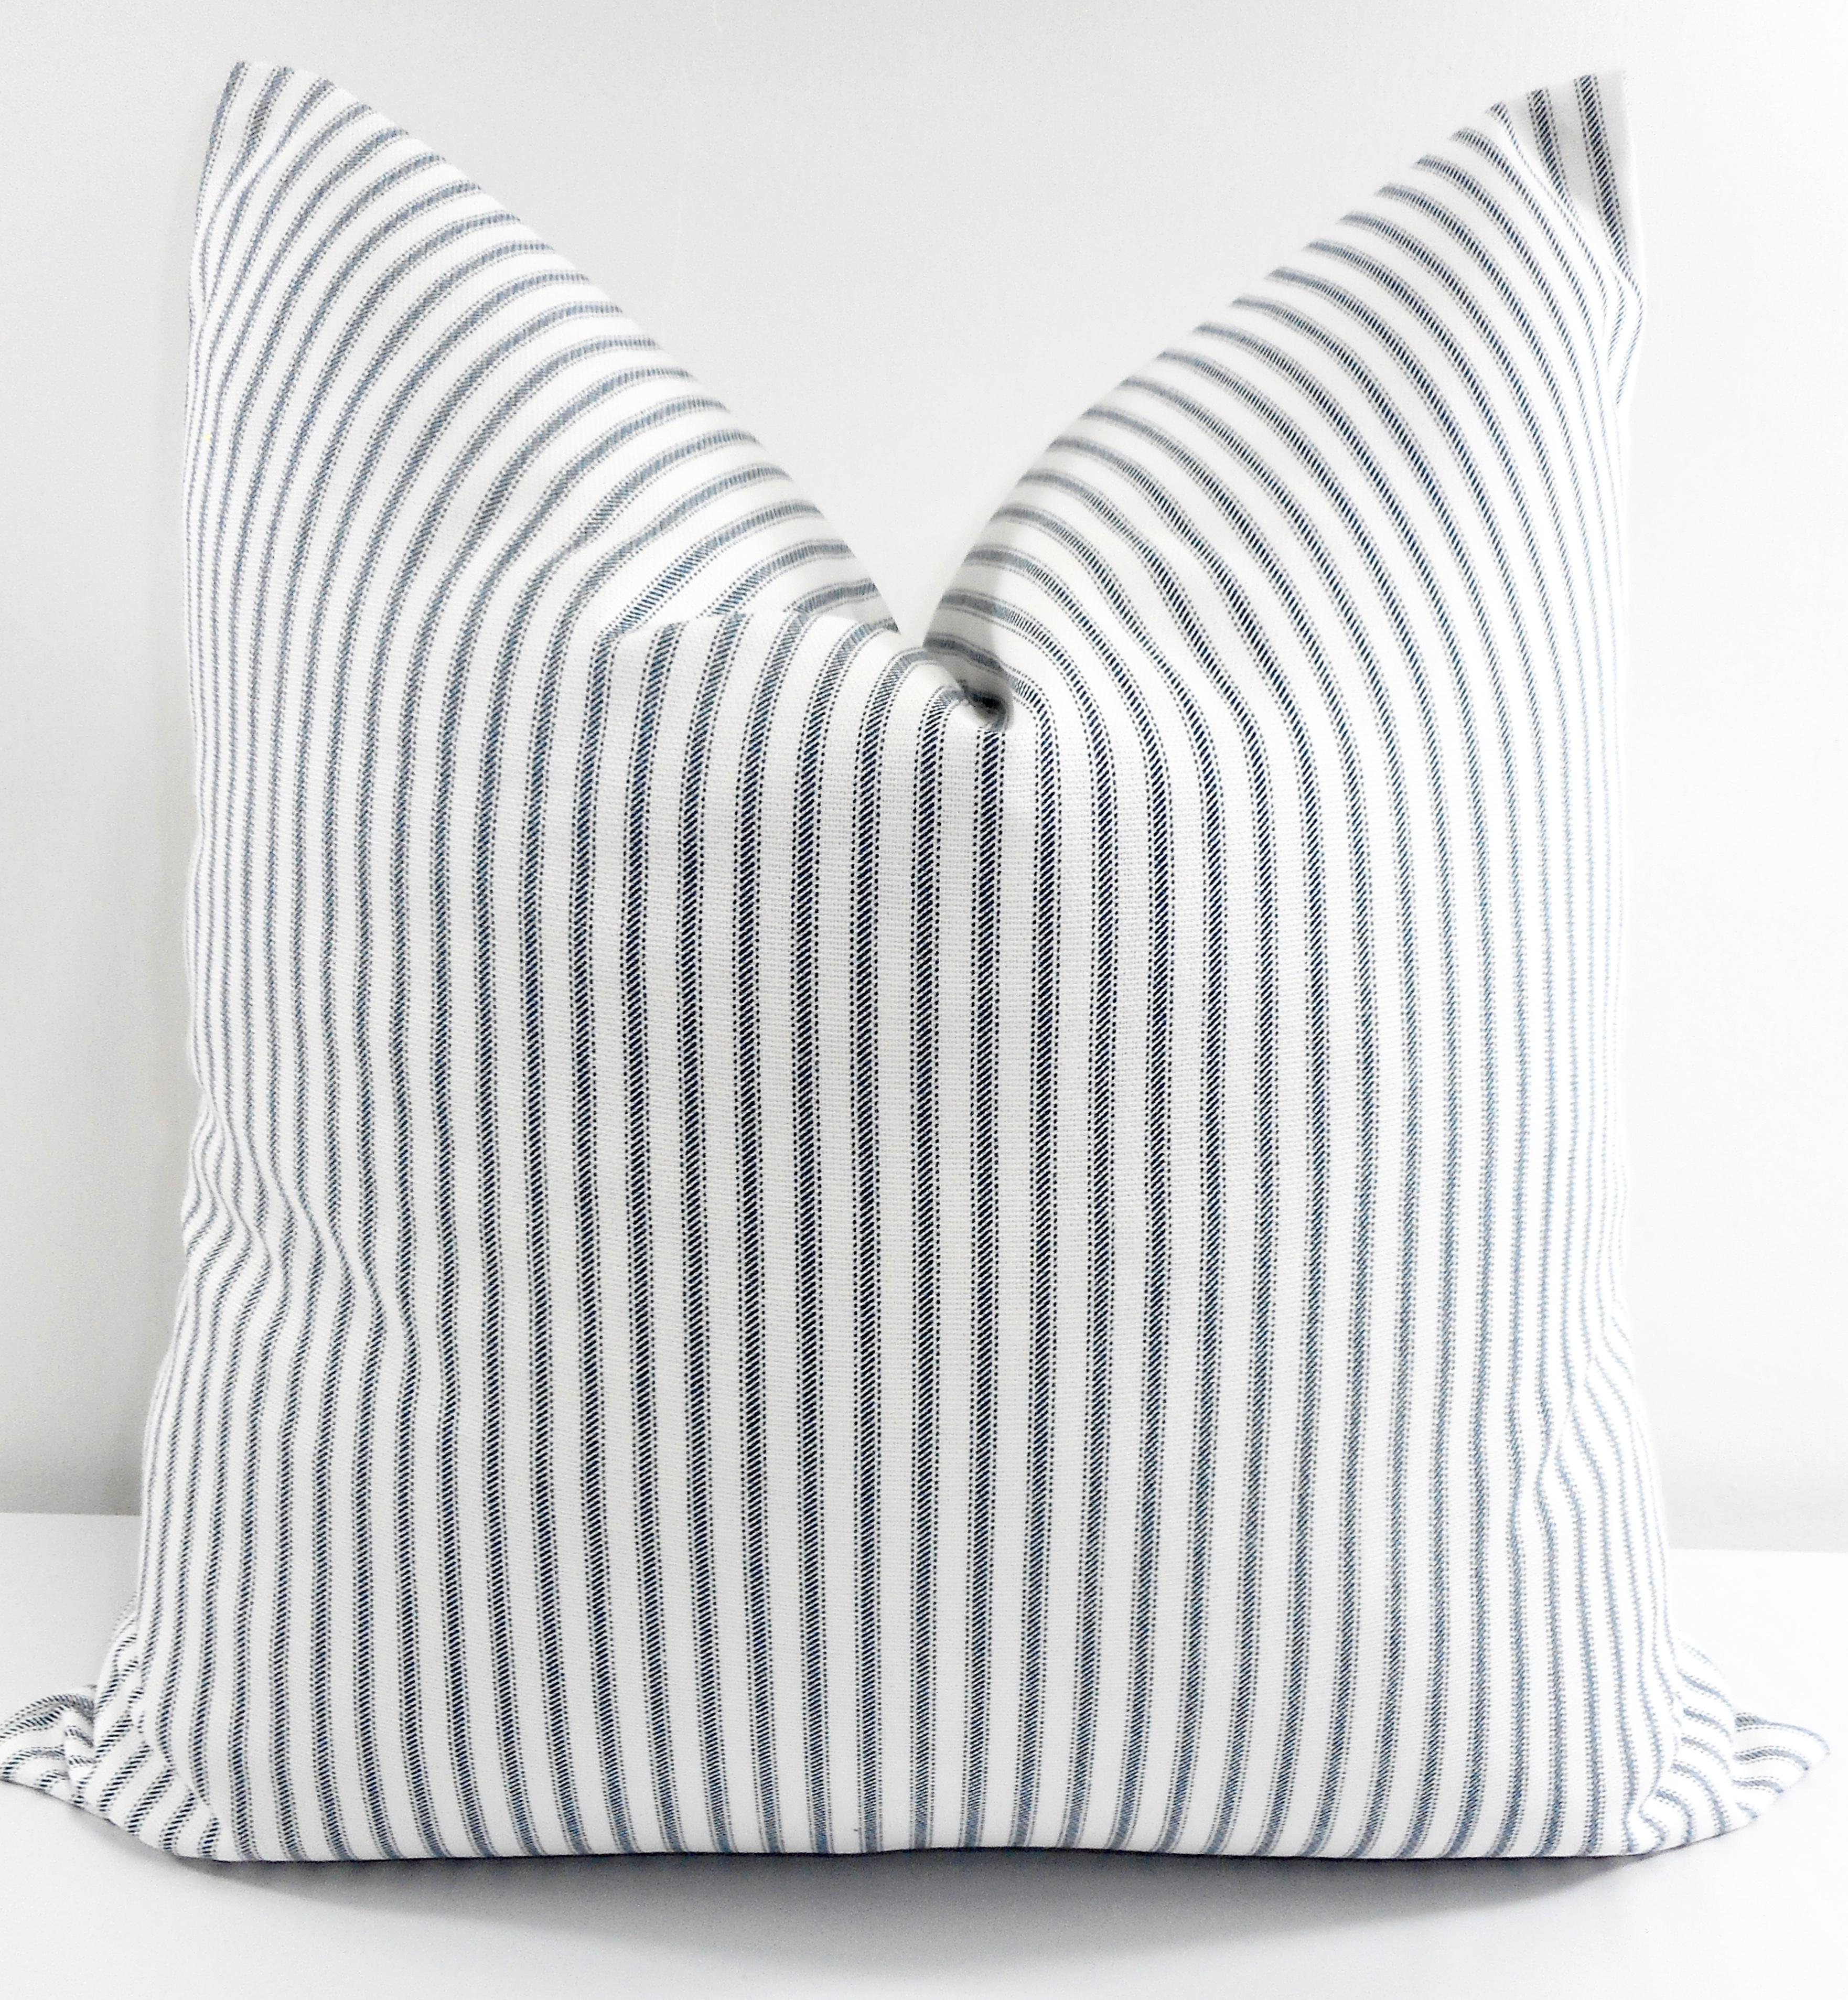 blue classic stripe pillow cover premier blue white stripe print sofa pillow cover throw pillow cover euro pillow case select size